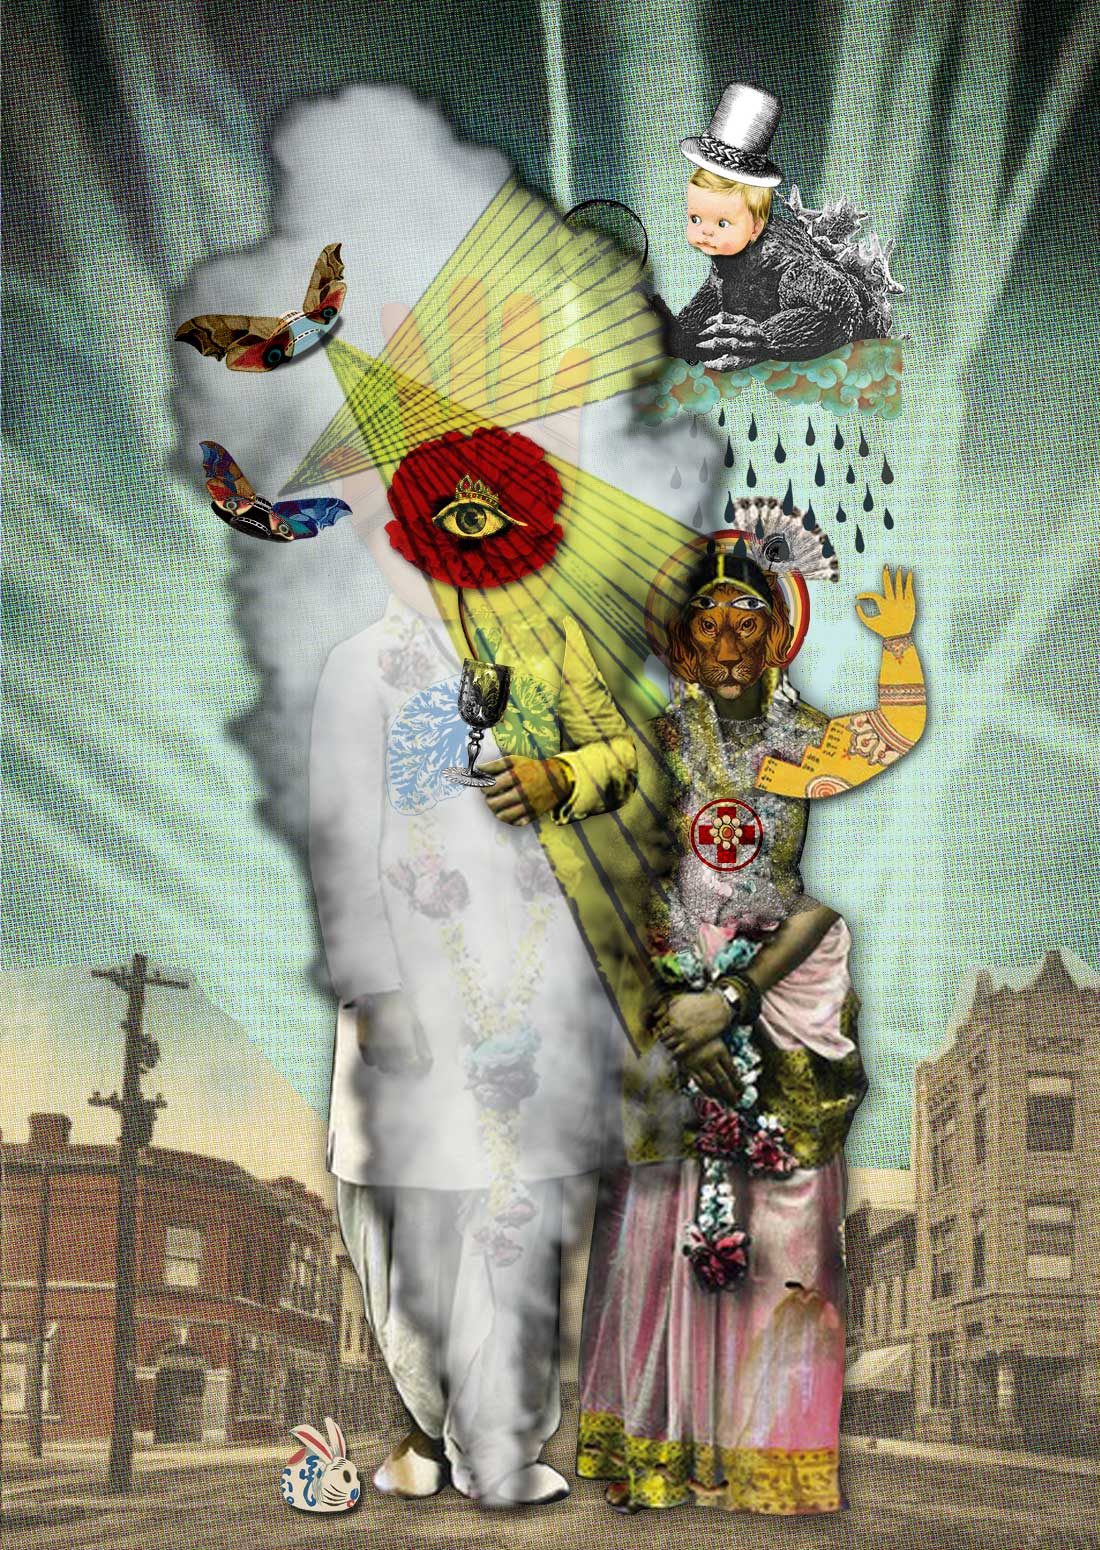 Severine Perrier illustrateur Freelance illustration collage papier art fantaisie luxe exotisme mode gravures anciennes histoires à raconter installation assemblage